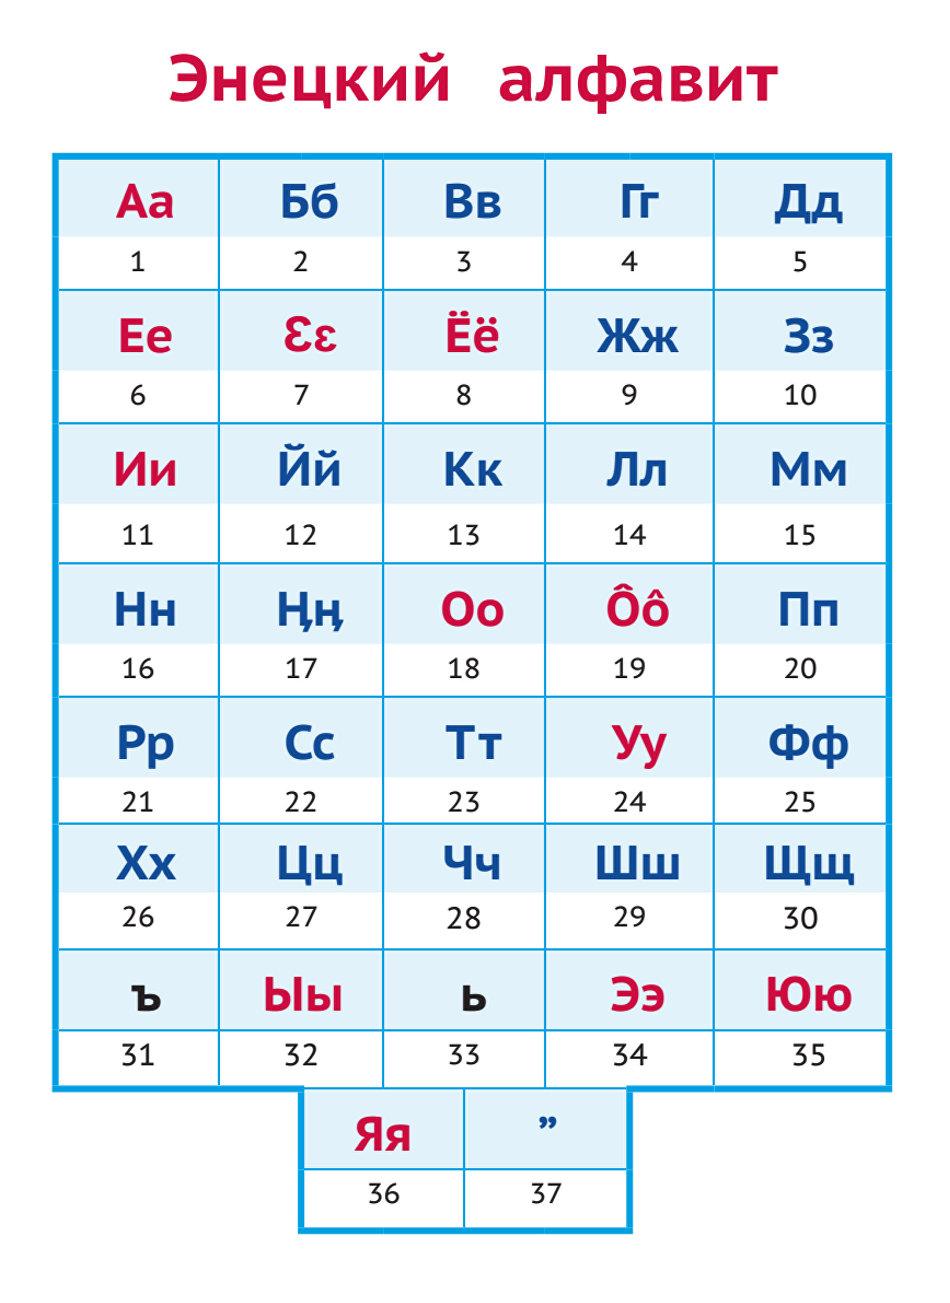 Энецкий алфавит